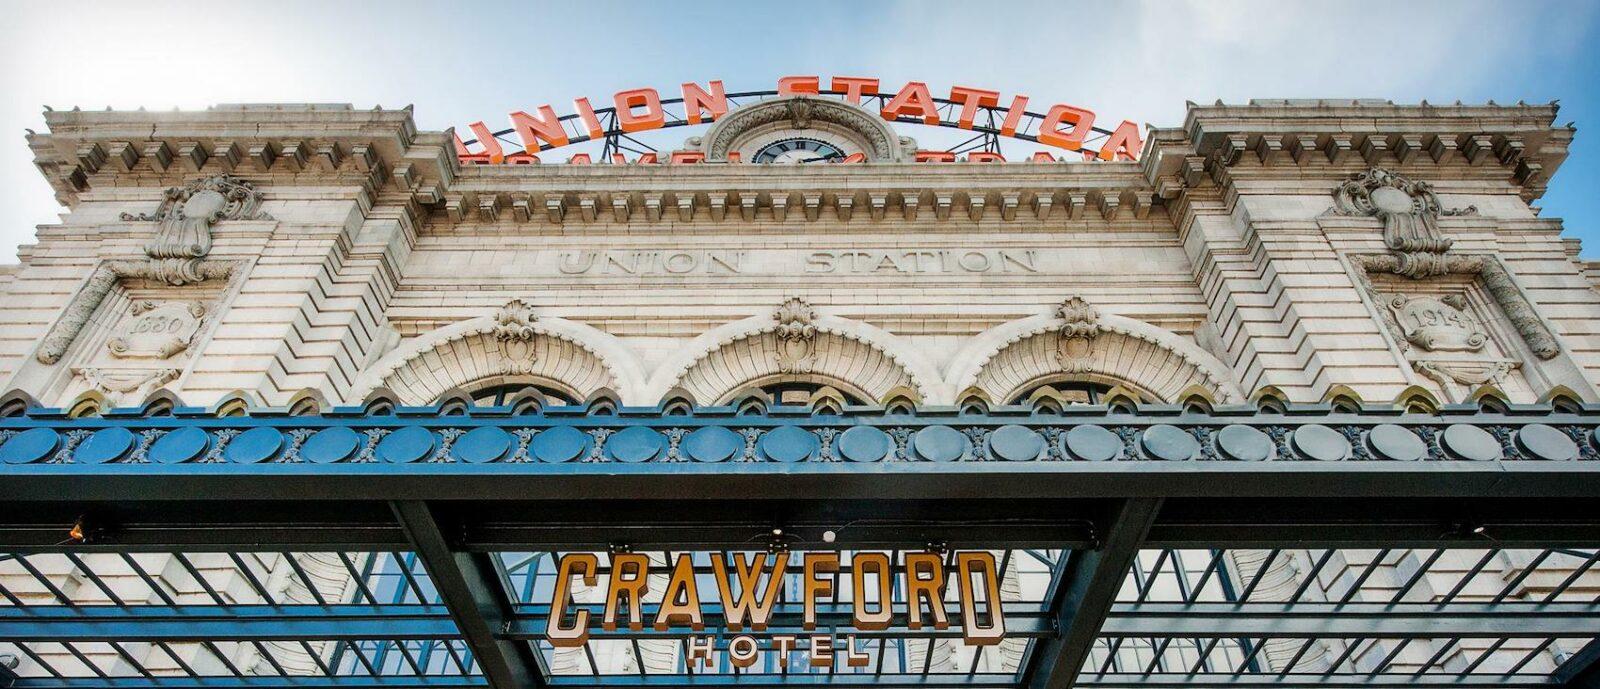 Image of the Crawford Hotel in Denver, Colorado